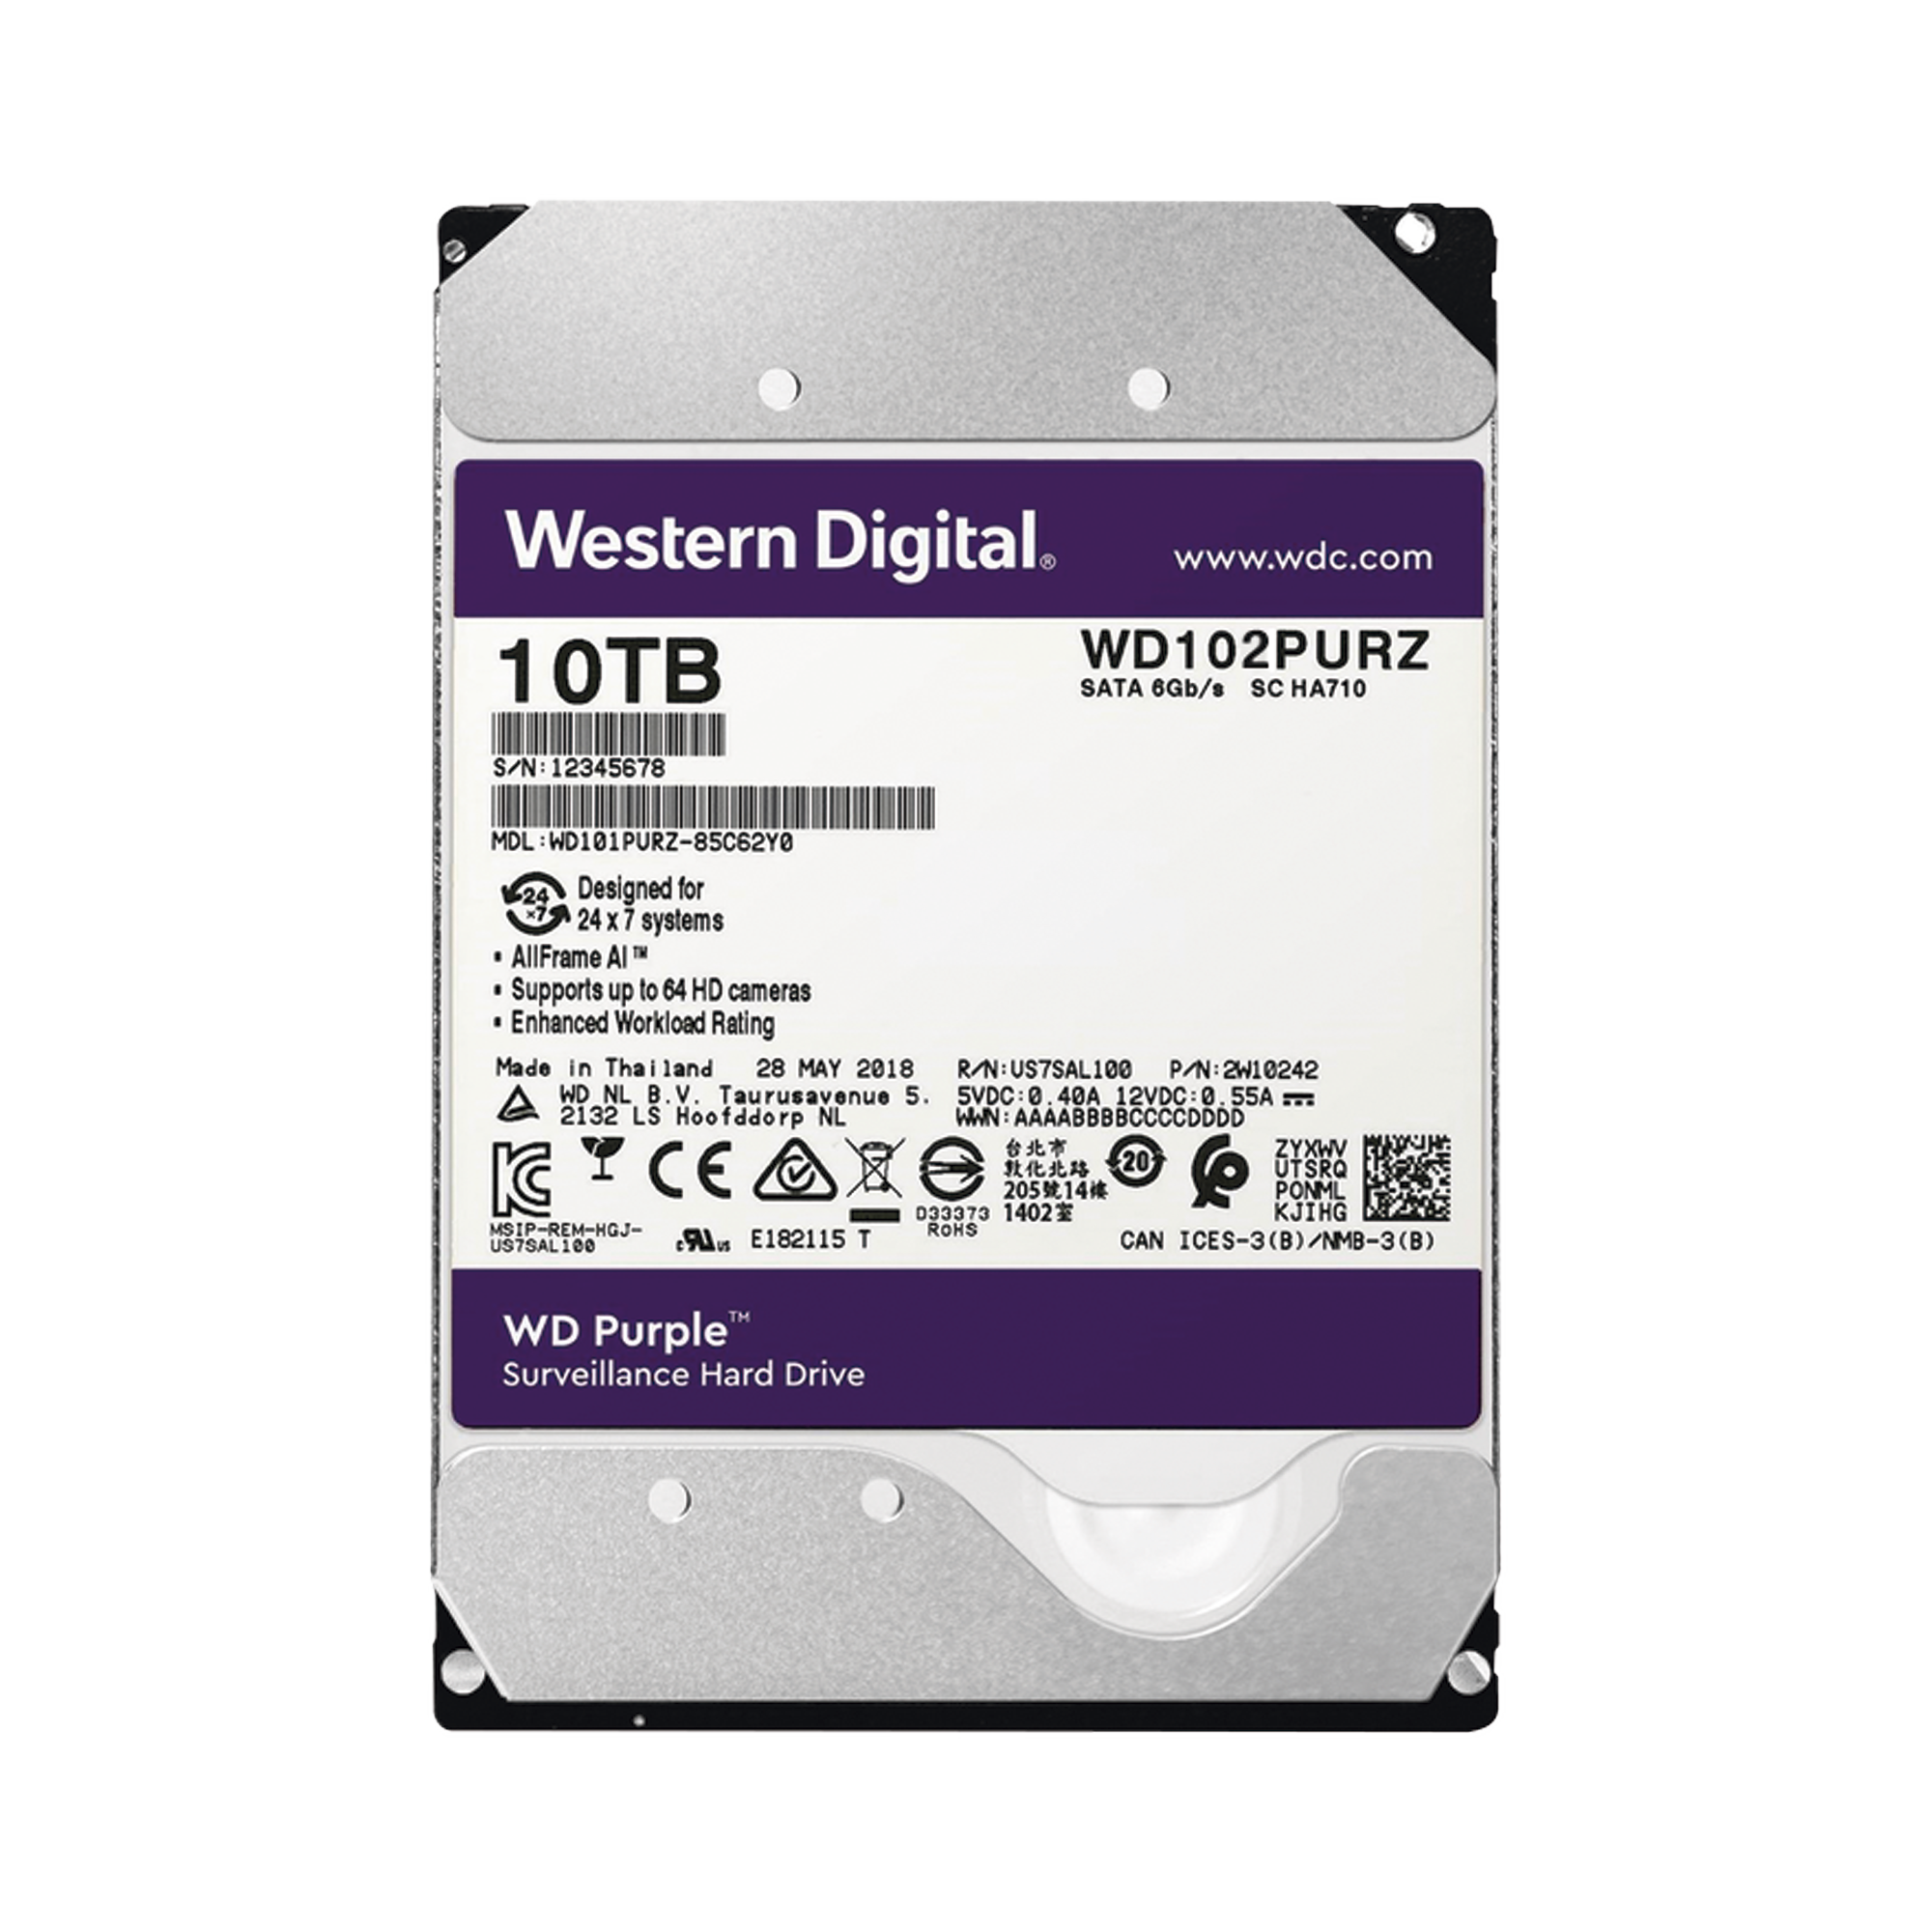 Disco duro WD de 10TB / 7200RPM / Optimizado para Videovigilancia